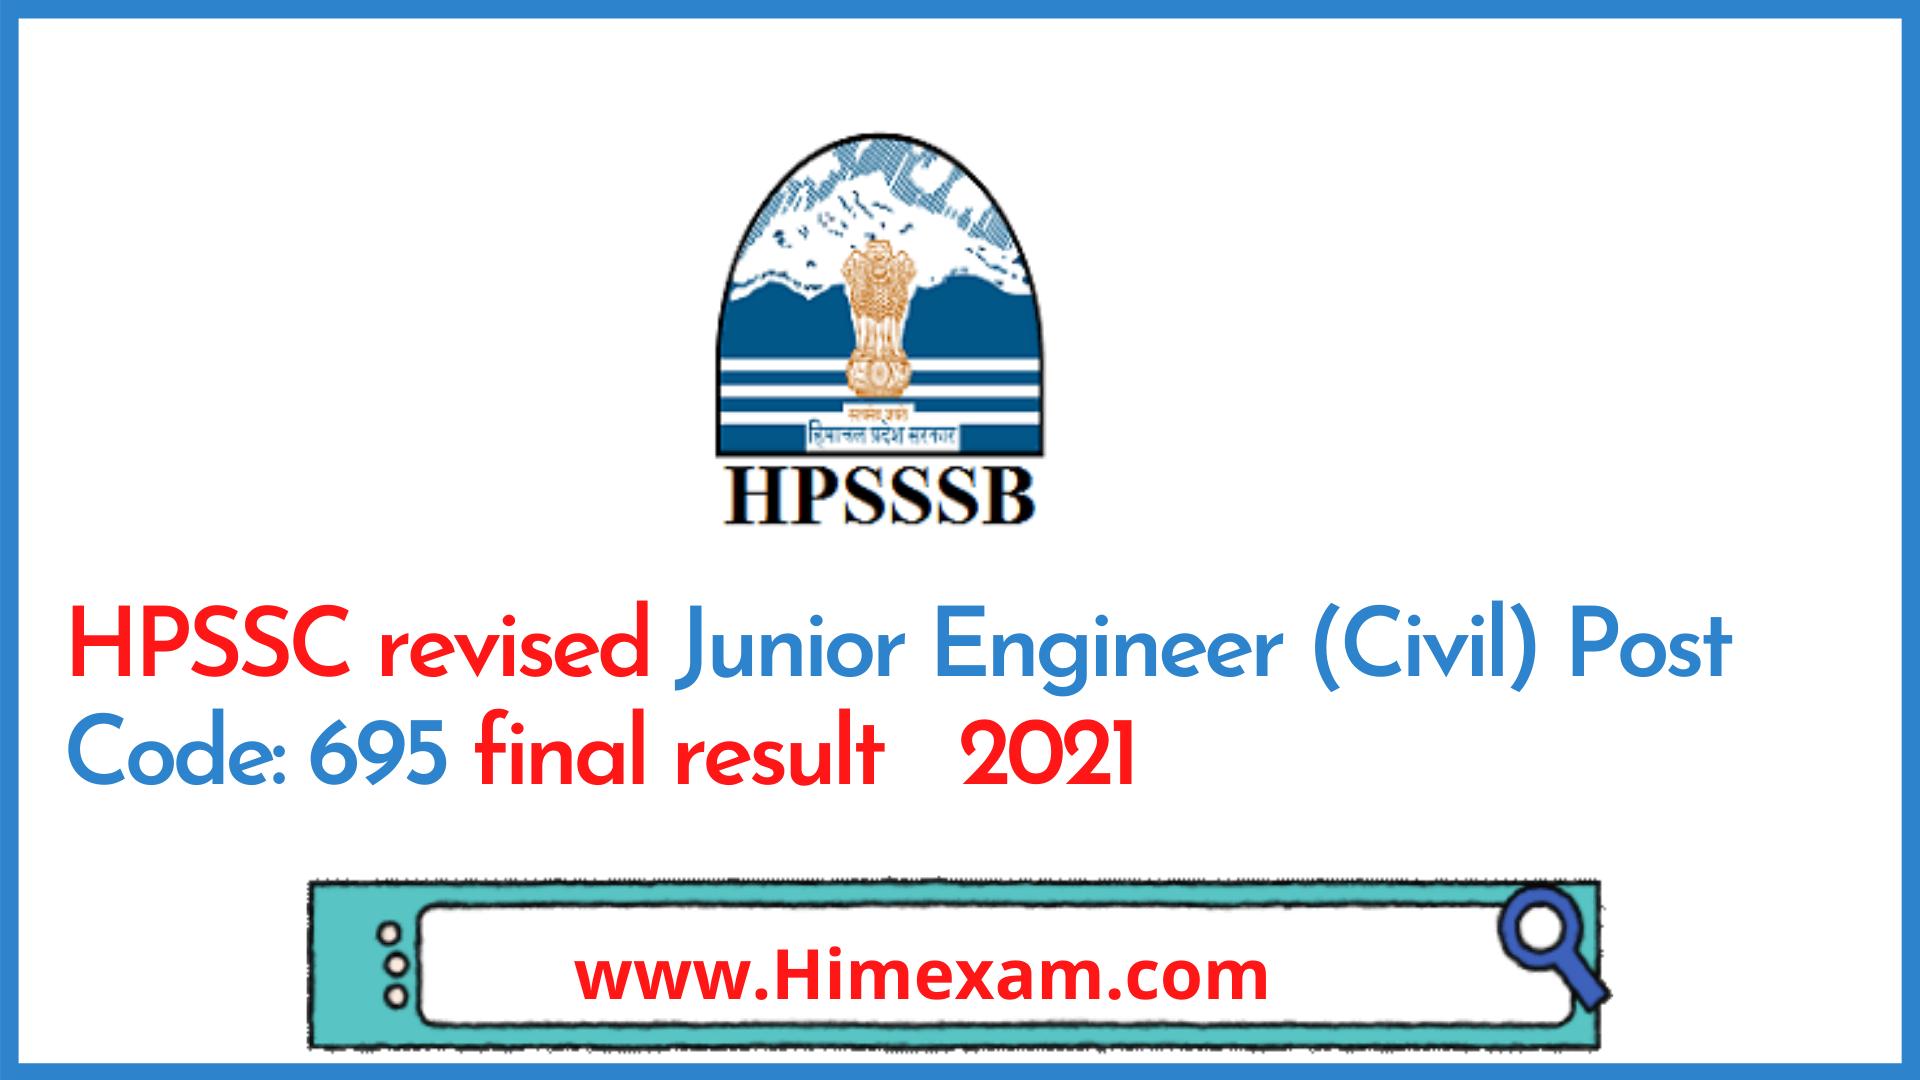 HPSSC revised Junior Engineer (Civil) Post Code: 695 final result   2021